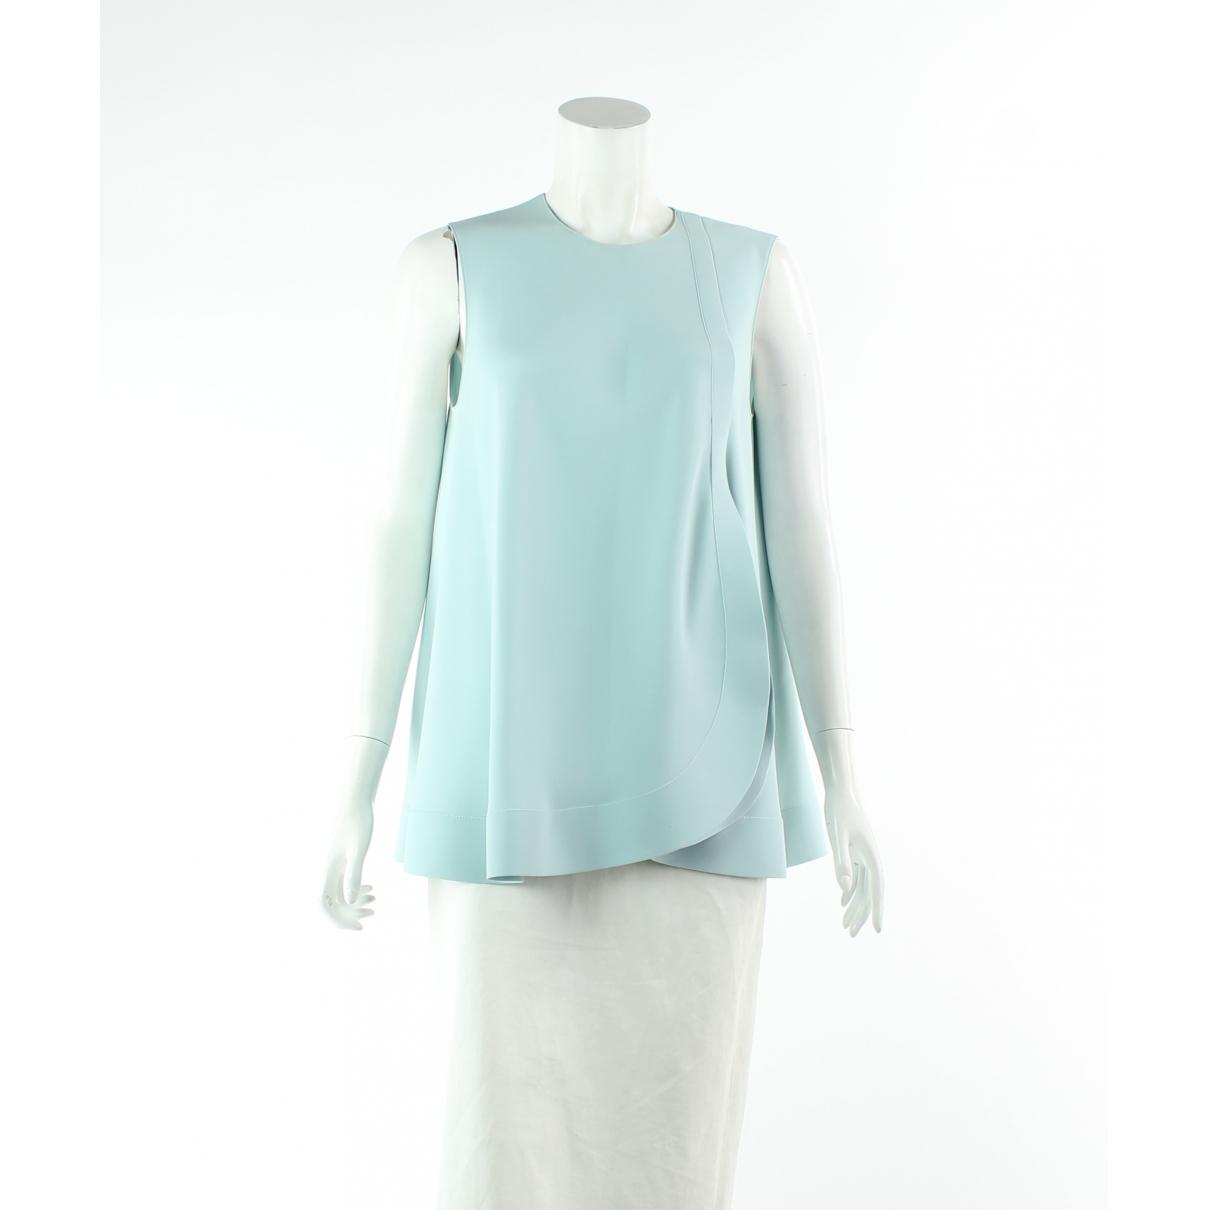 Balenciaga \N Top in  Blau Polyester